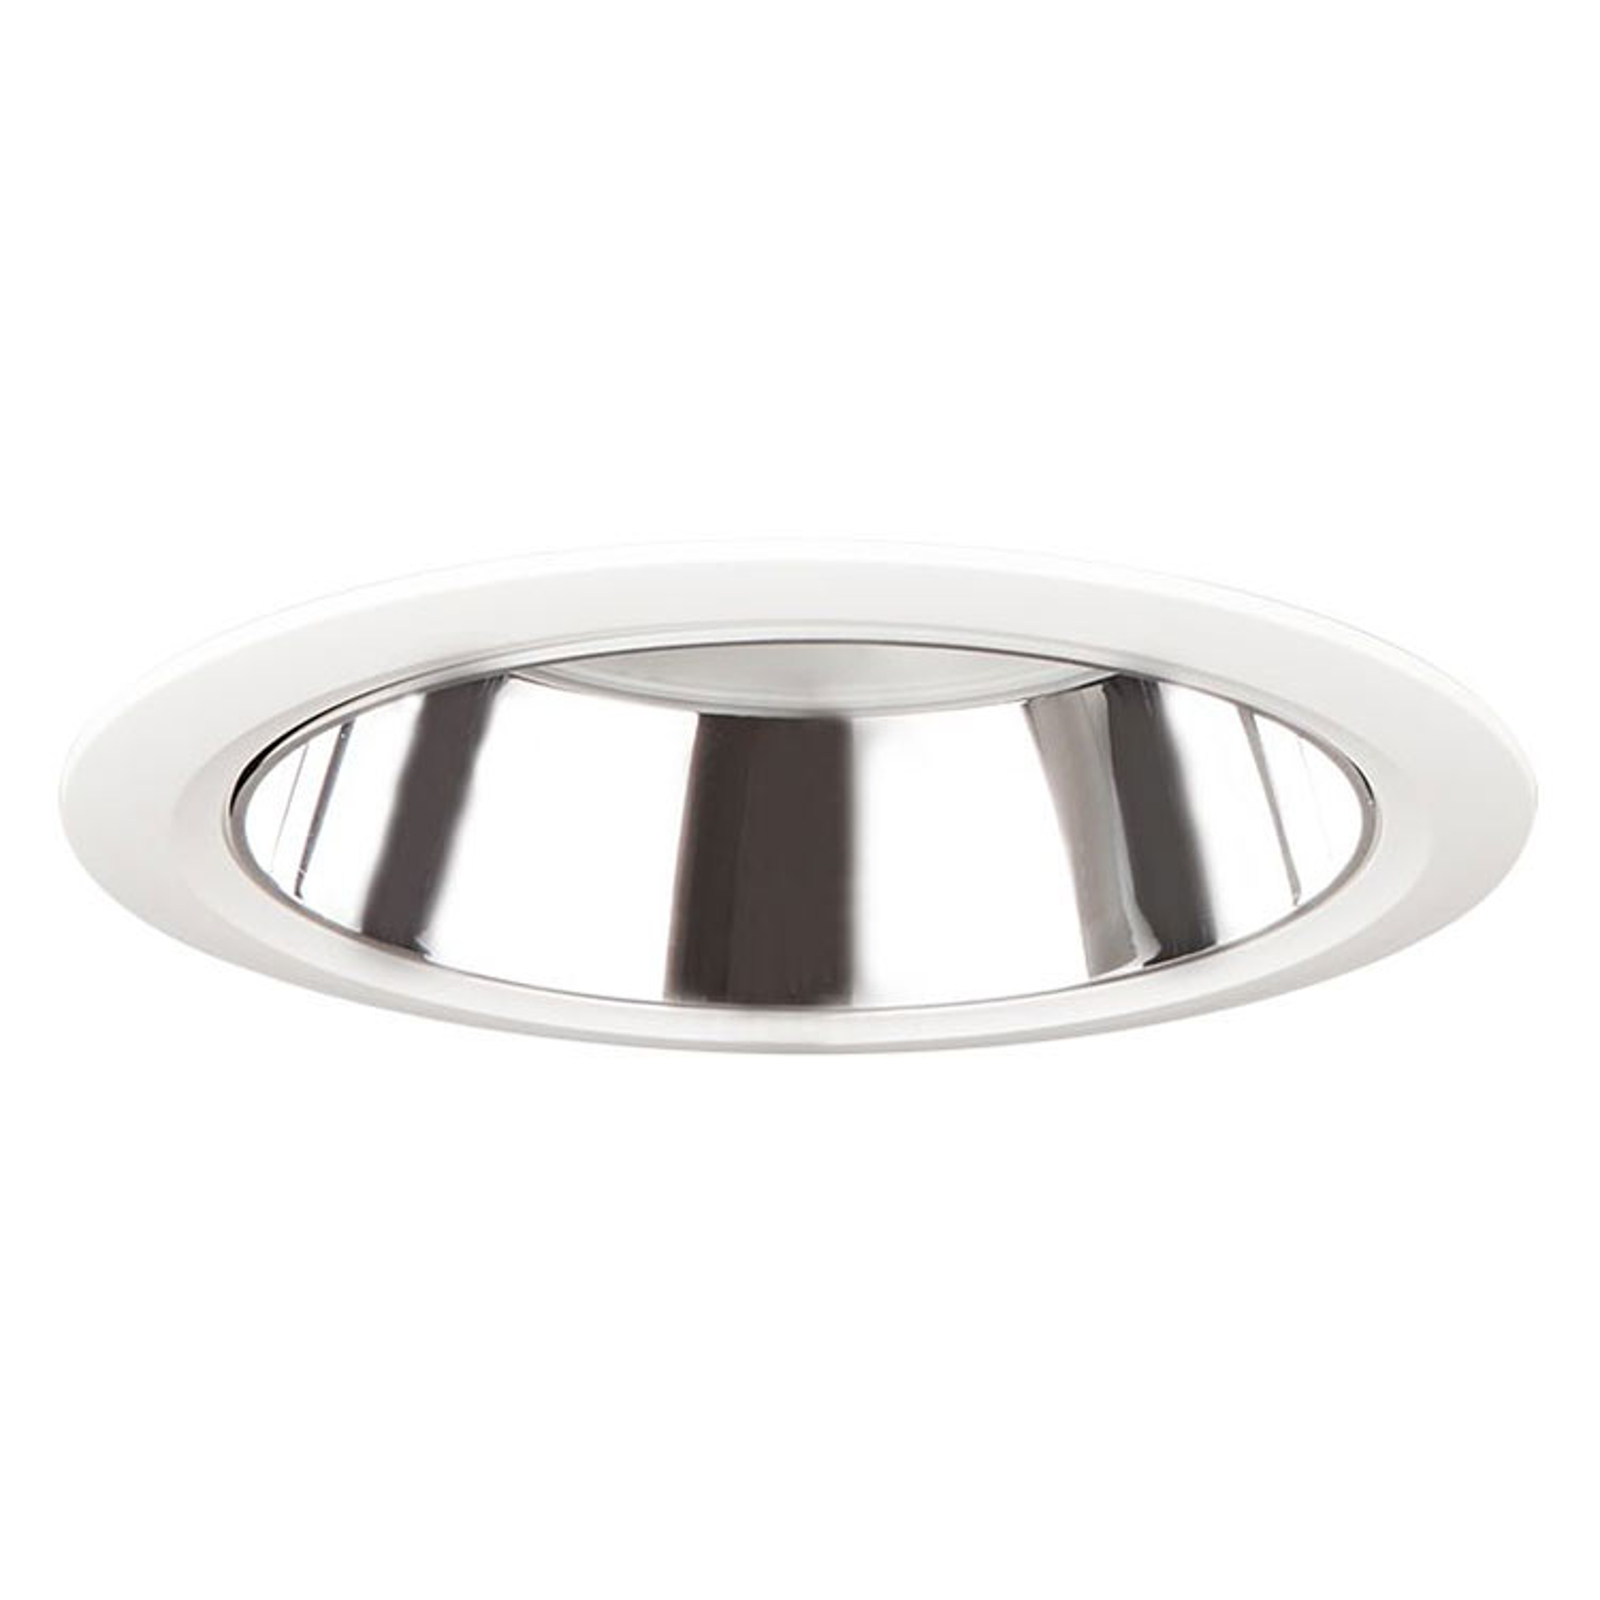 D70-RF155 downlight DALI sølv/hvit 4 000 K 14W